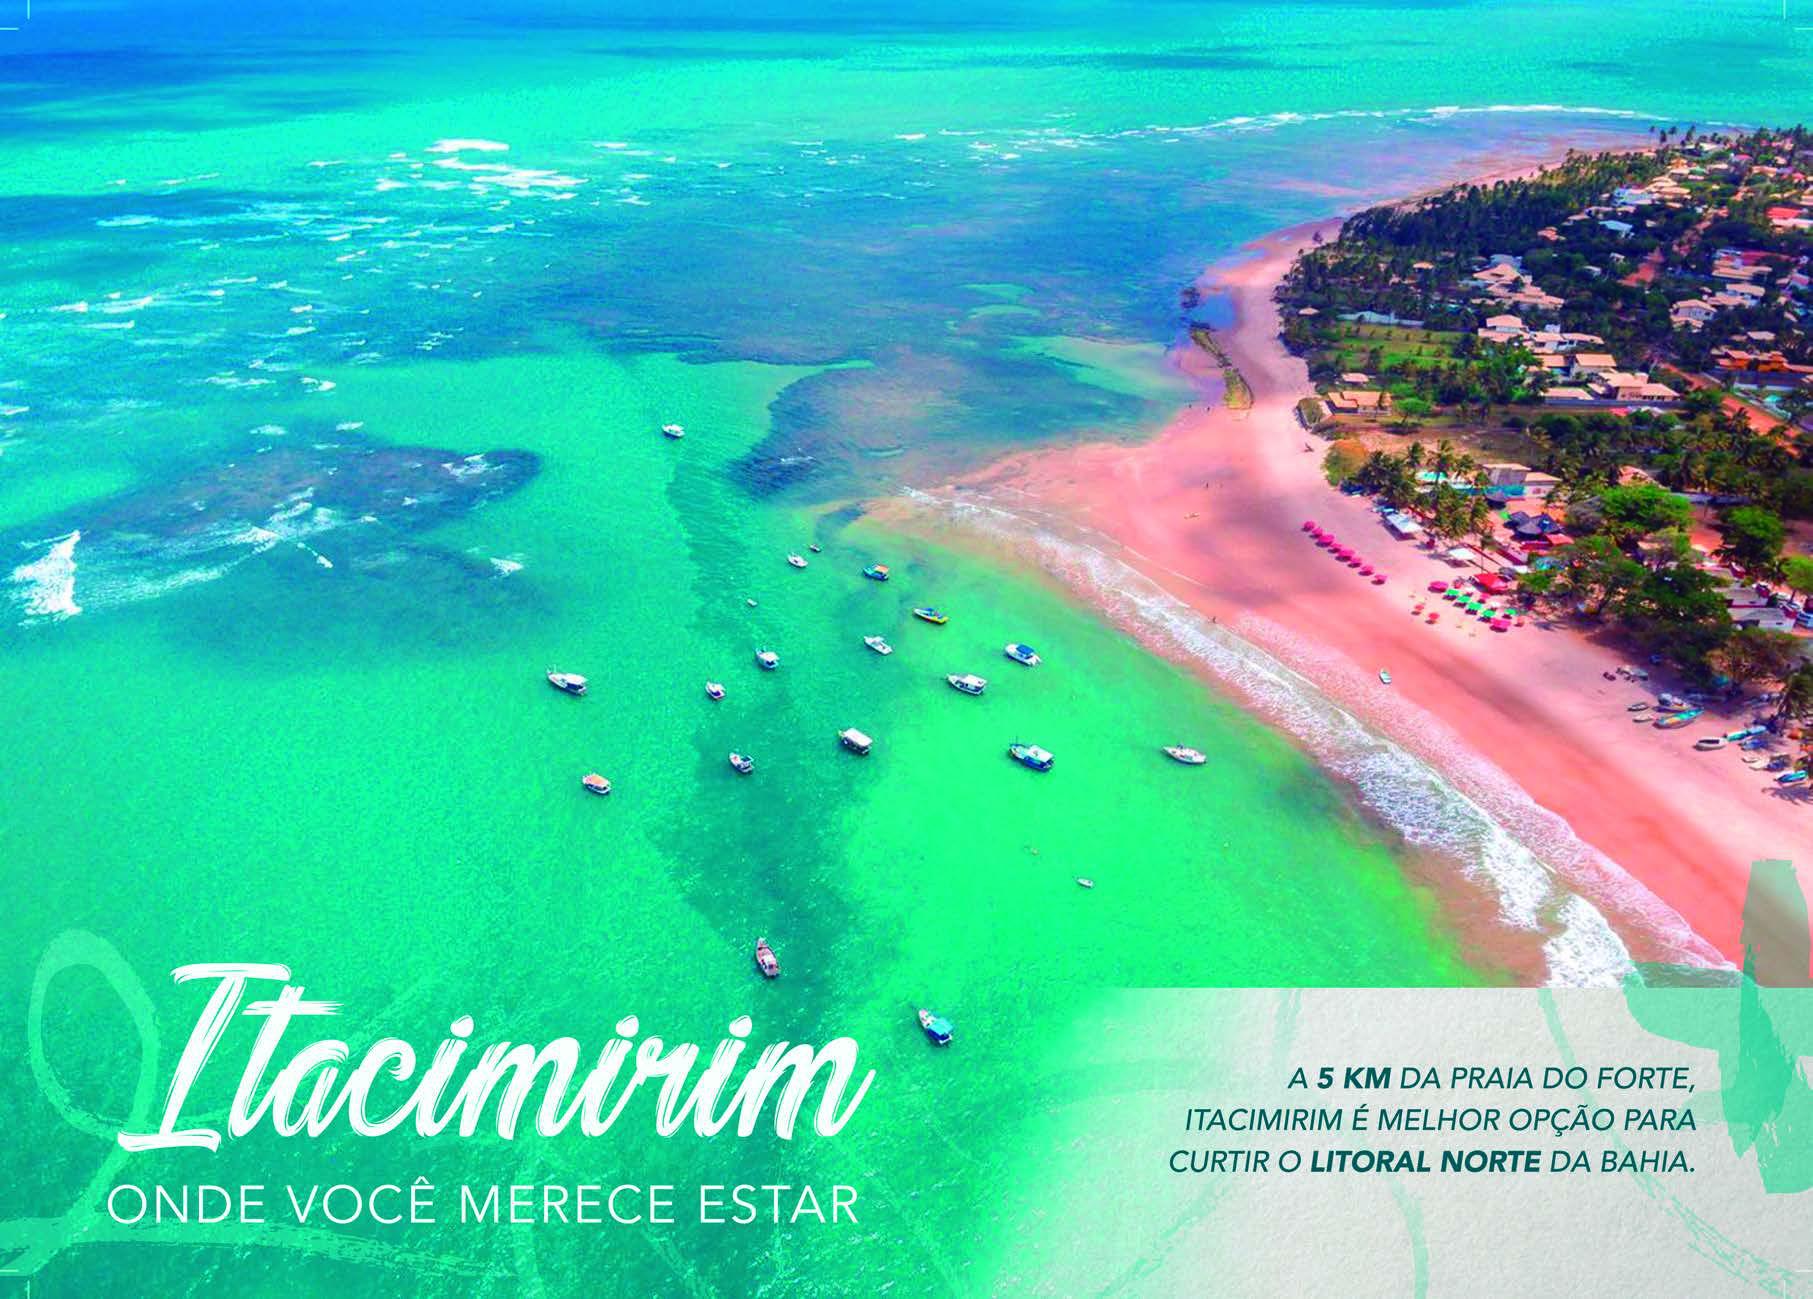 Foto aérea da praia de Itacimirim do Imperial Lounge Itacimirim